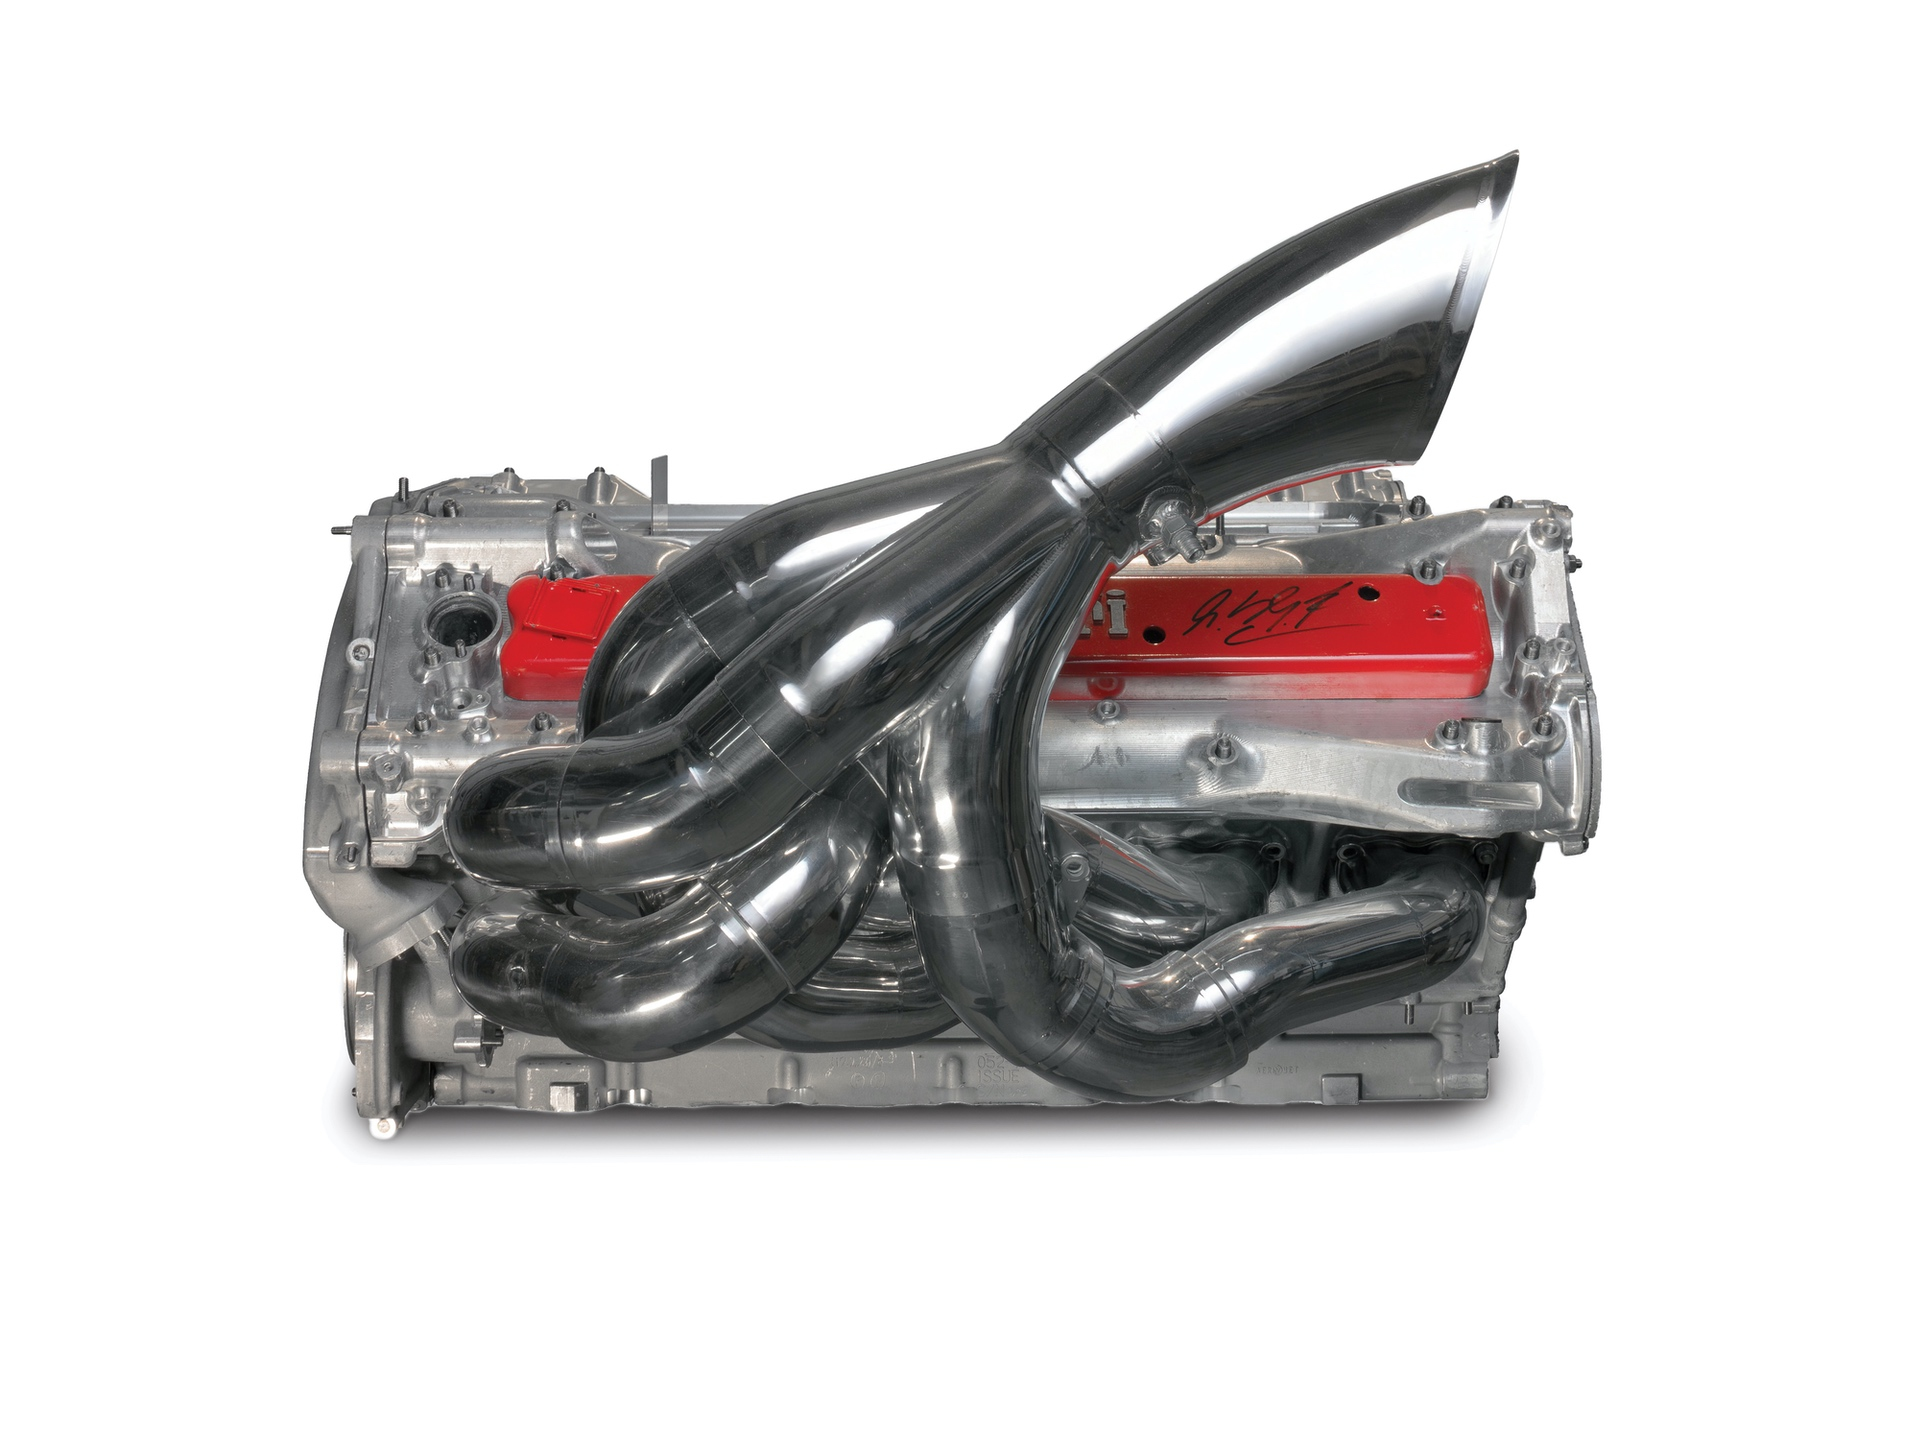 Ferrari_F2003-GA_Engine_0001